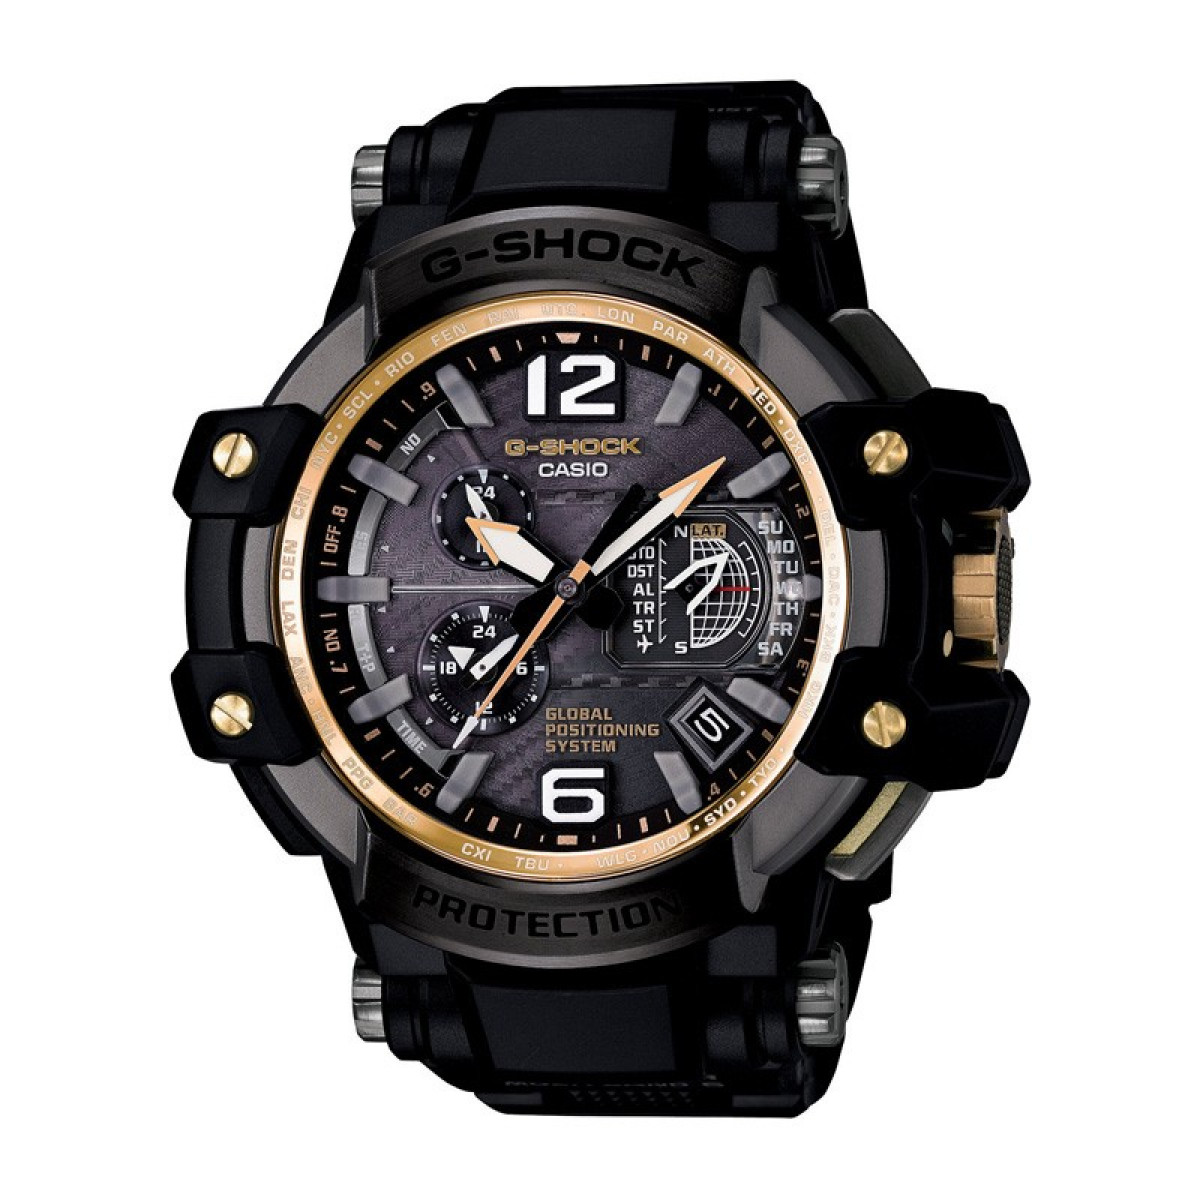 Часовник Casio G-Shock Gravitymaster GPW-1000FC-1A9ER